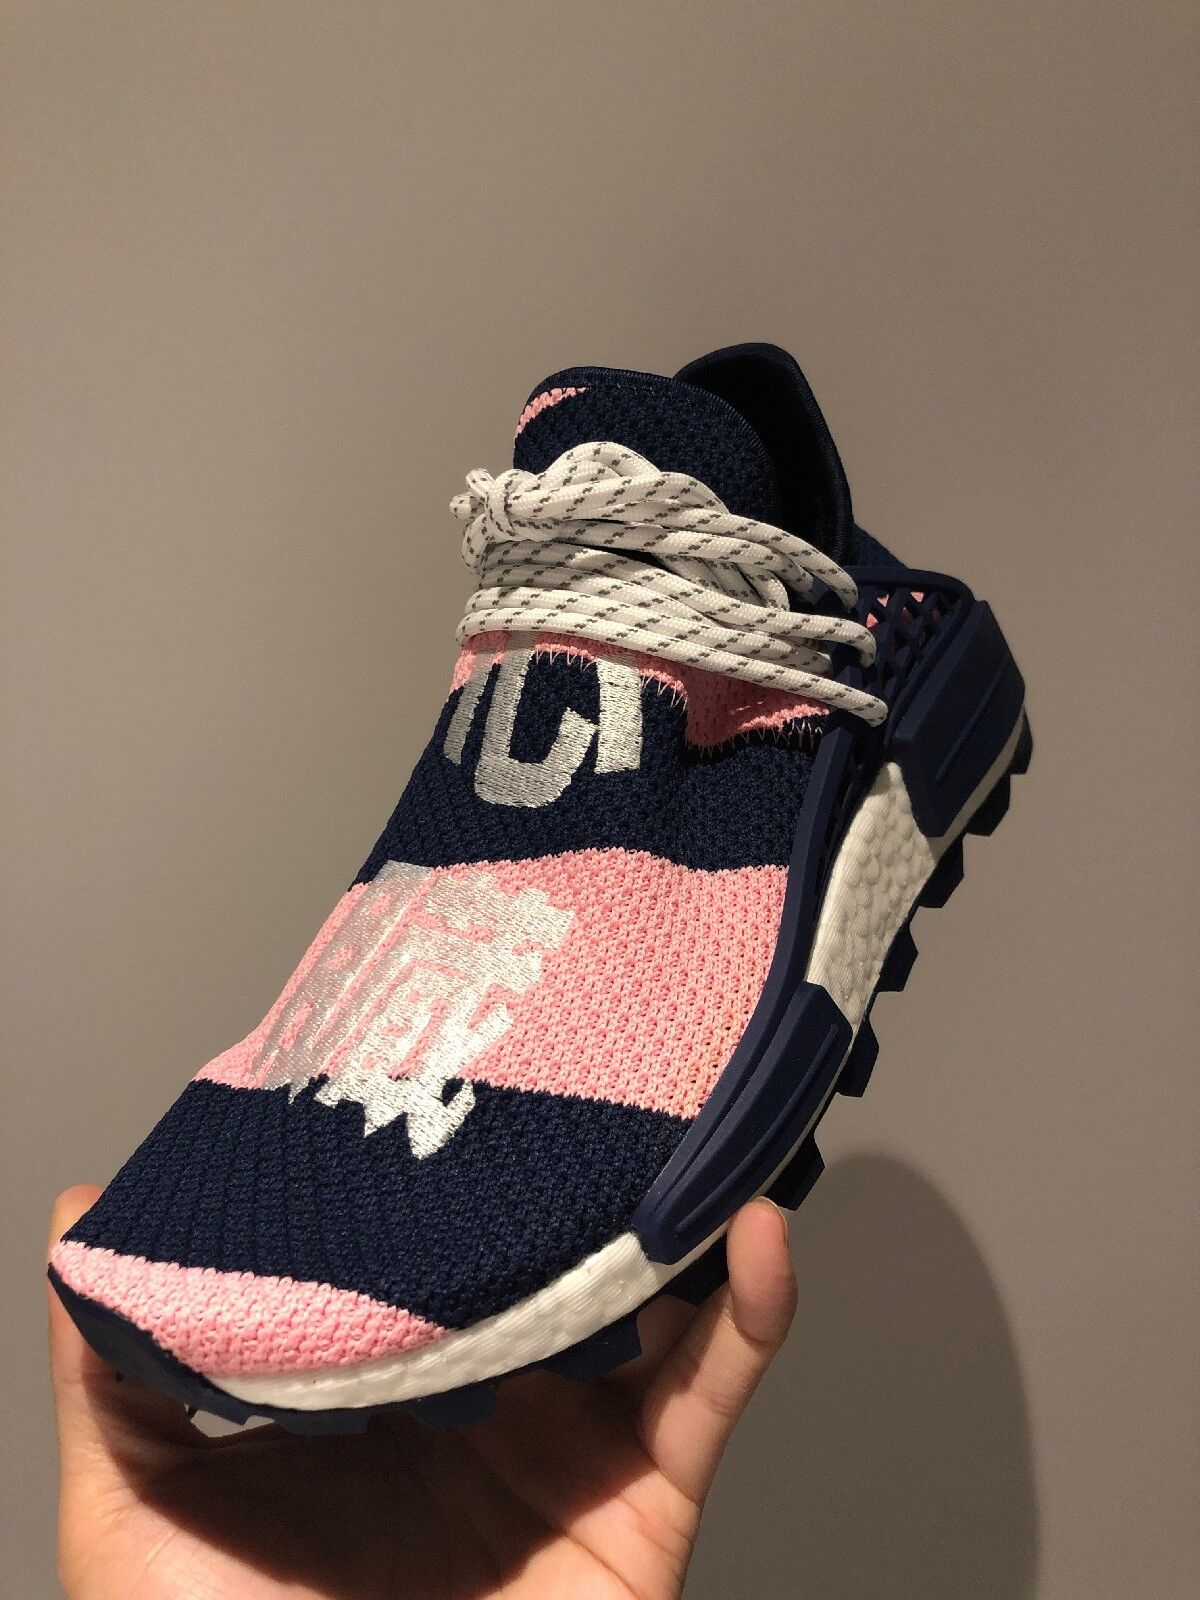 Pharrell Williams x adidas NMD Hu BBC G26277 UK7 US7.5 EU40 2 3 Pink Navy